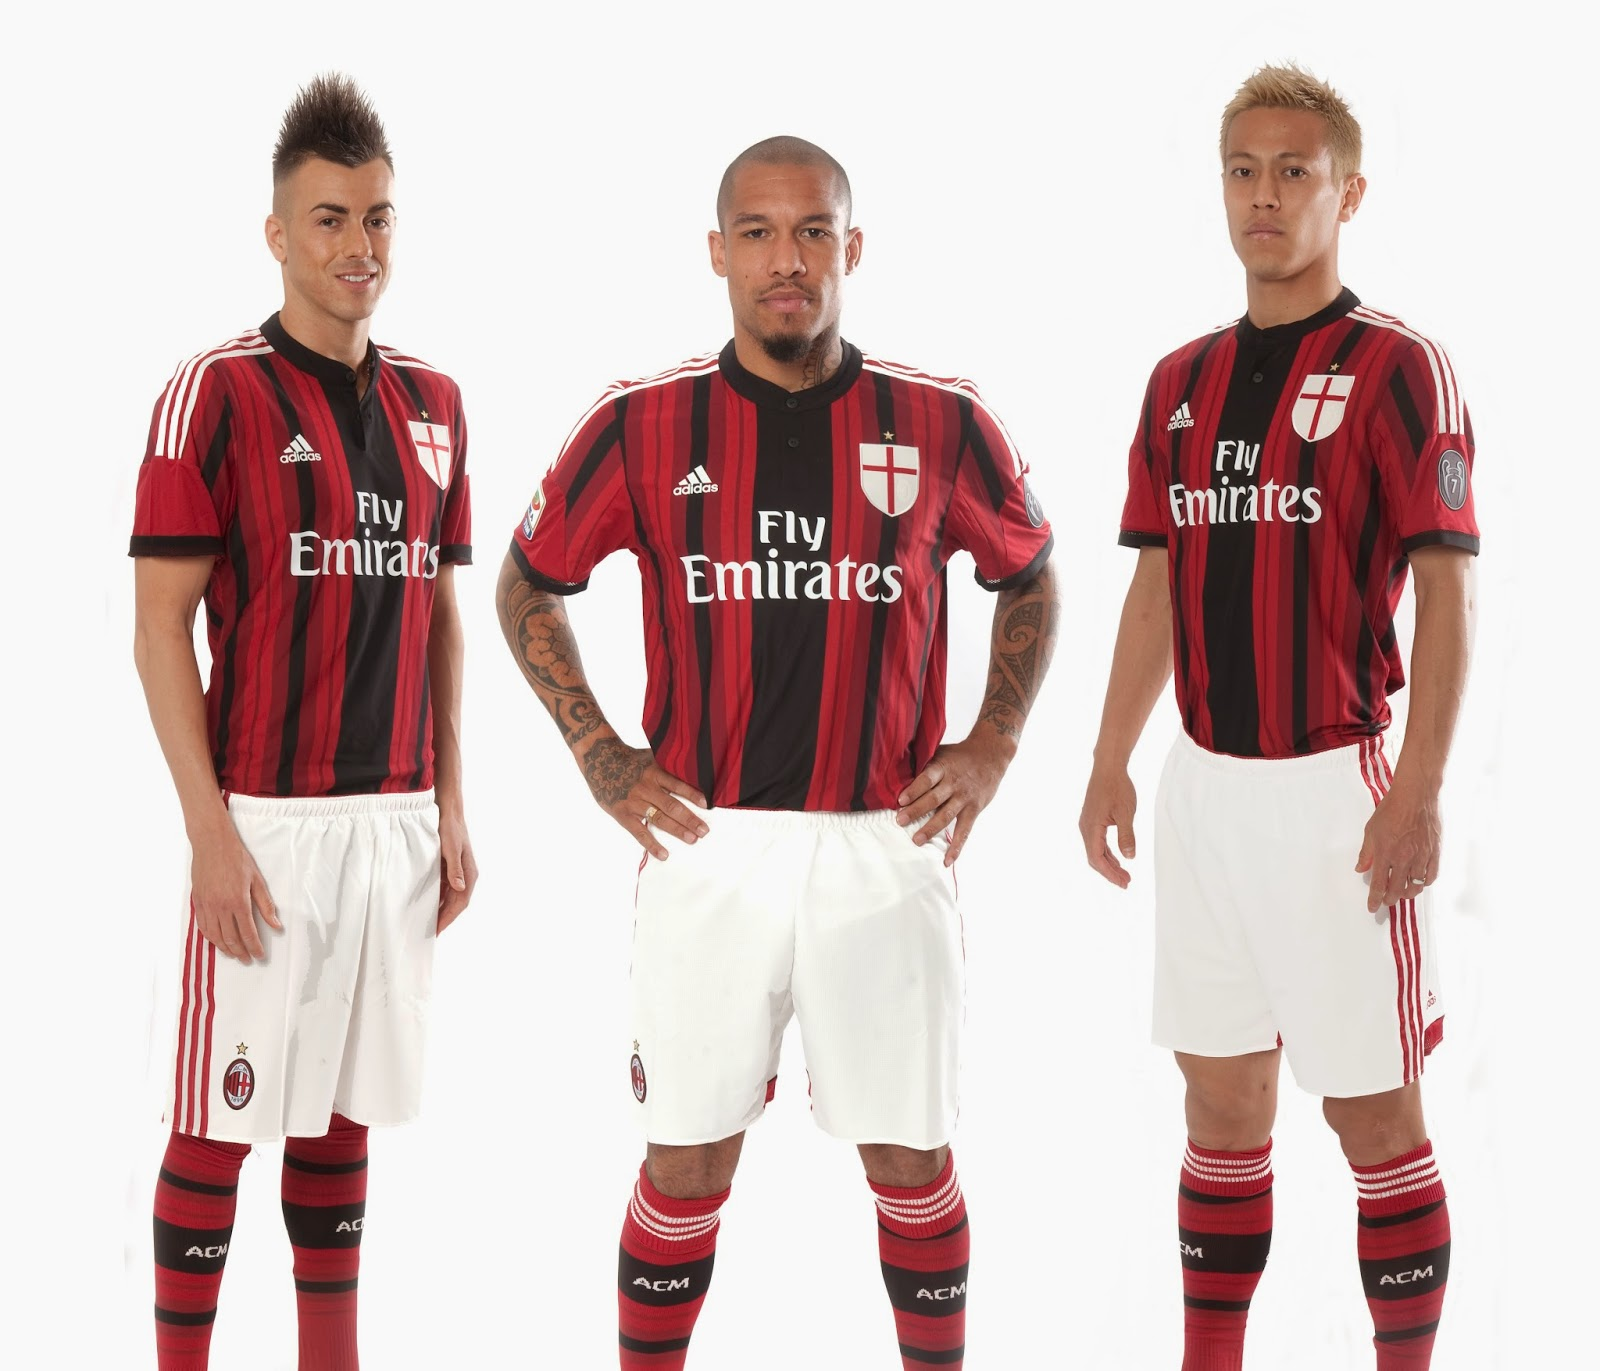 Nuova maglia Adidas Milan